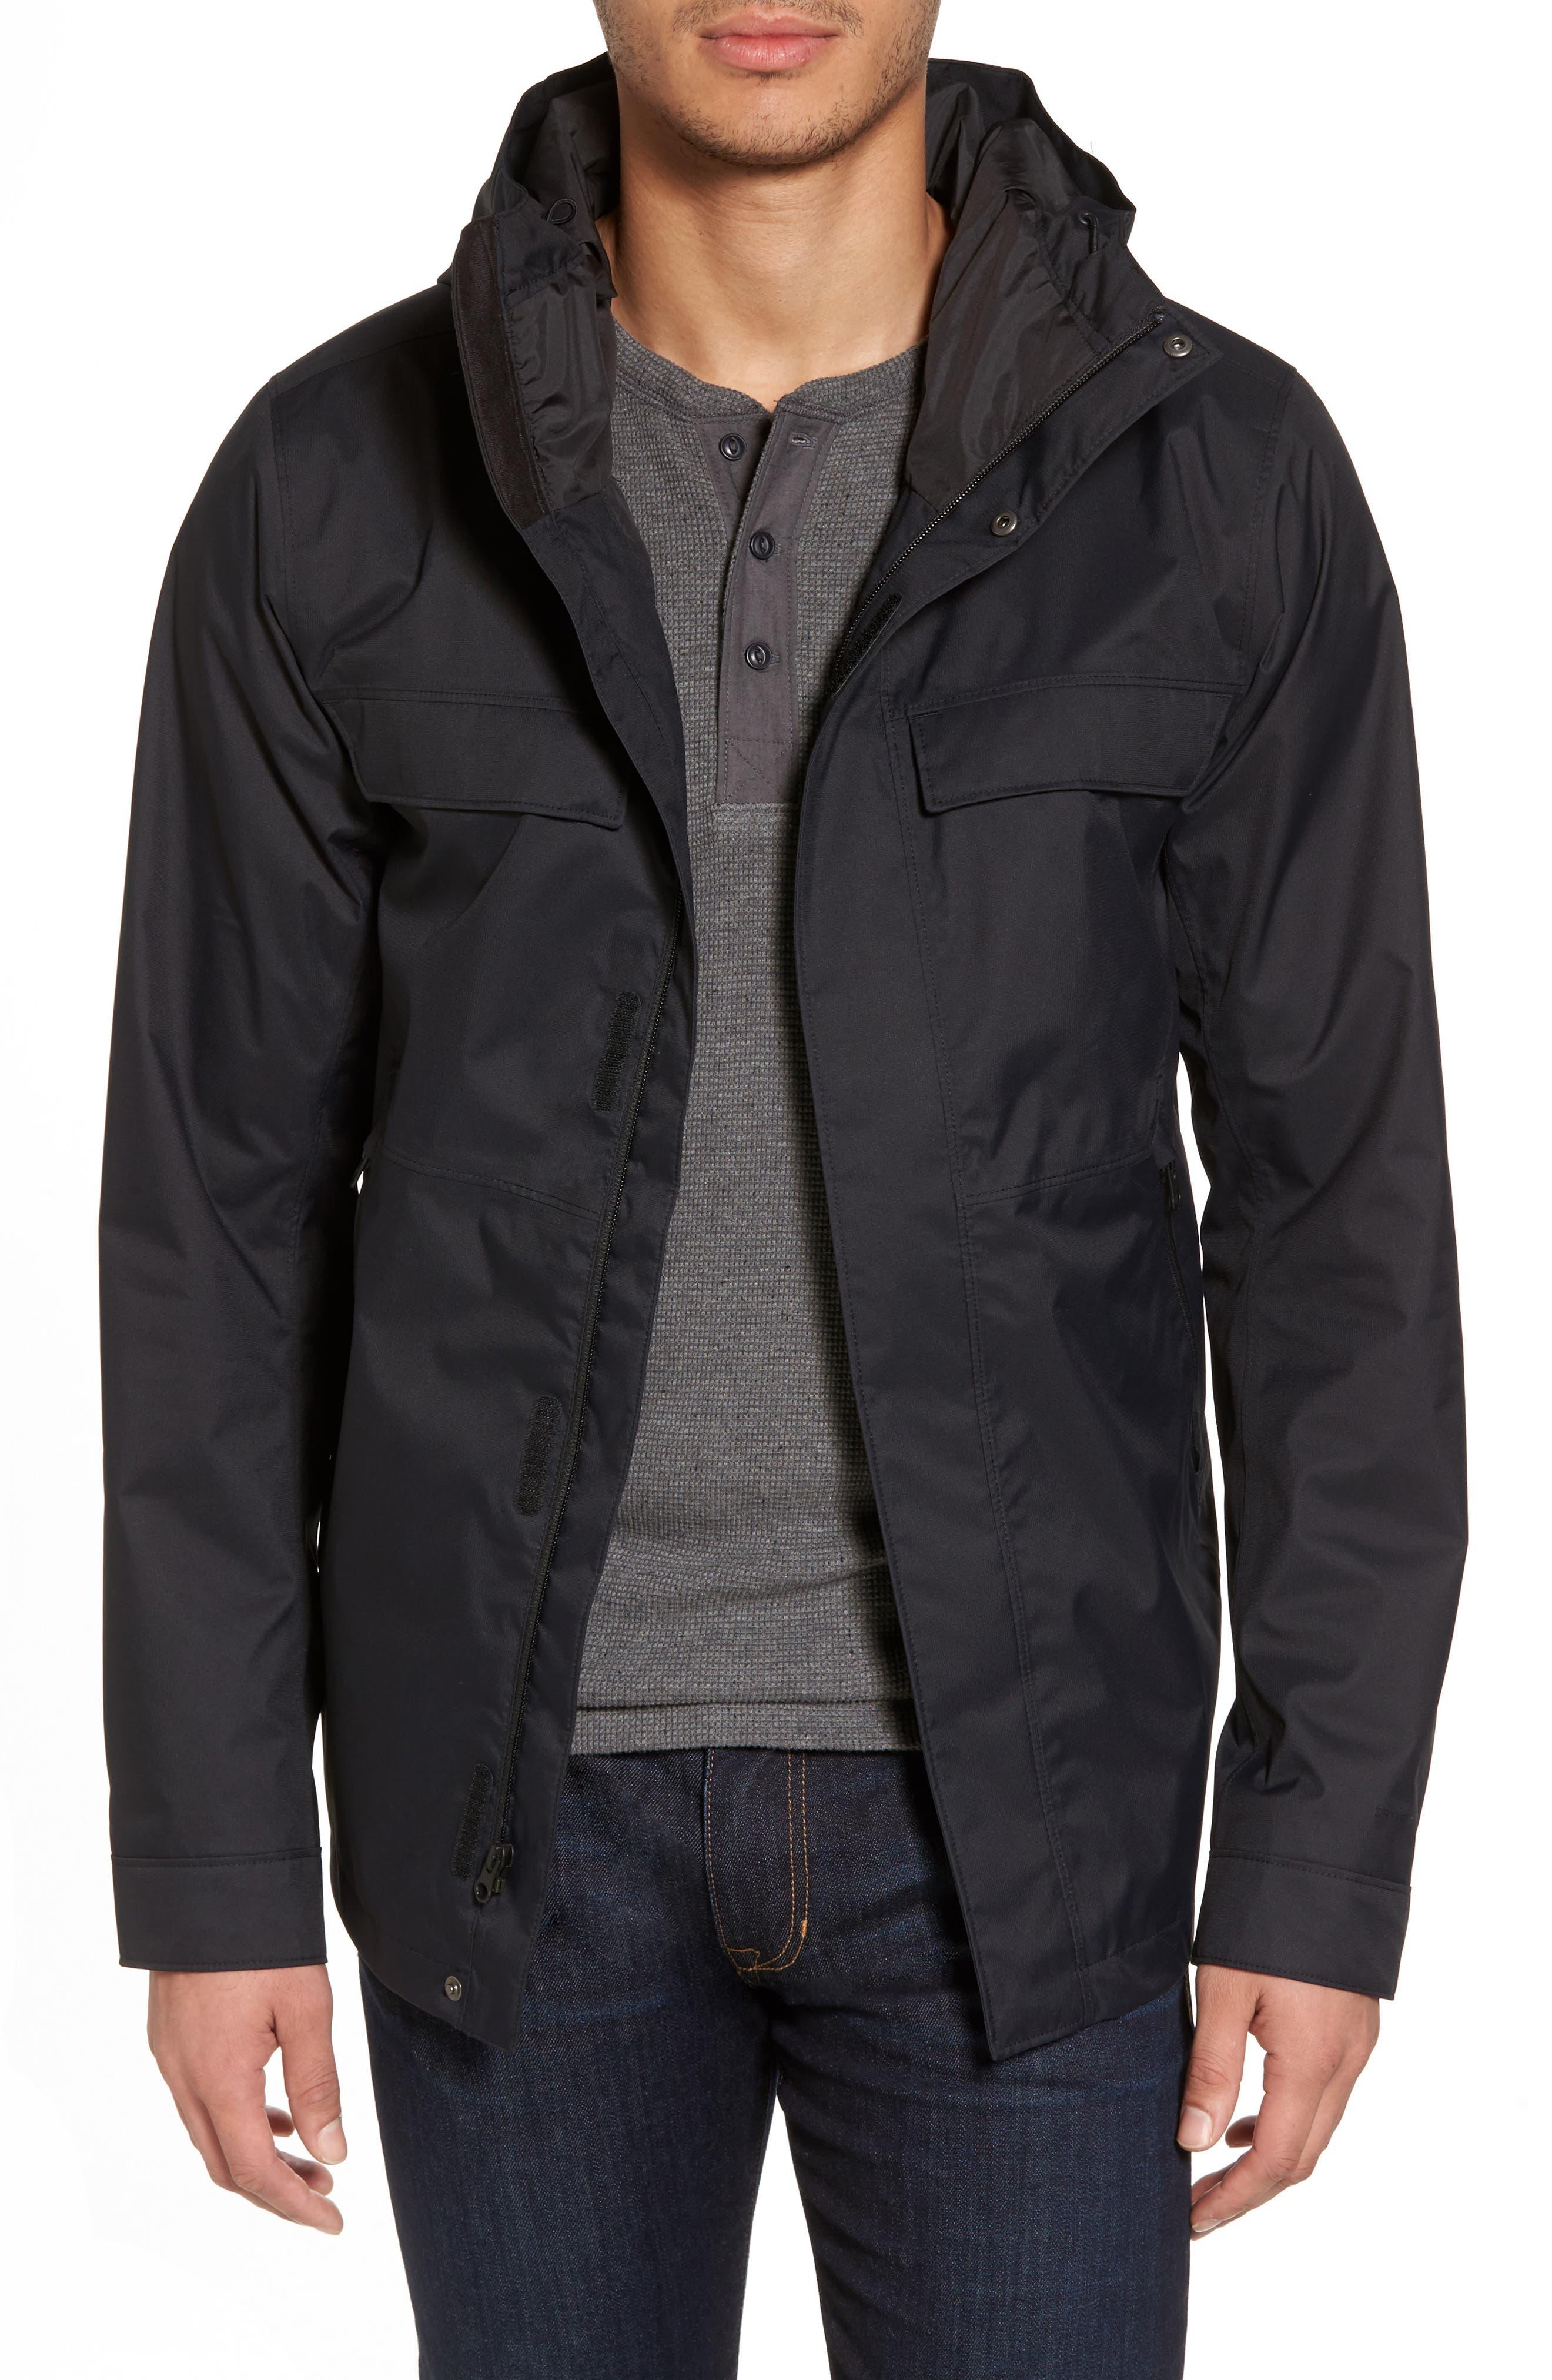 Jenison II Insulated Waterproof Jacket,                         Main,                         color, Tnf Black